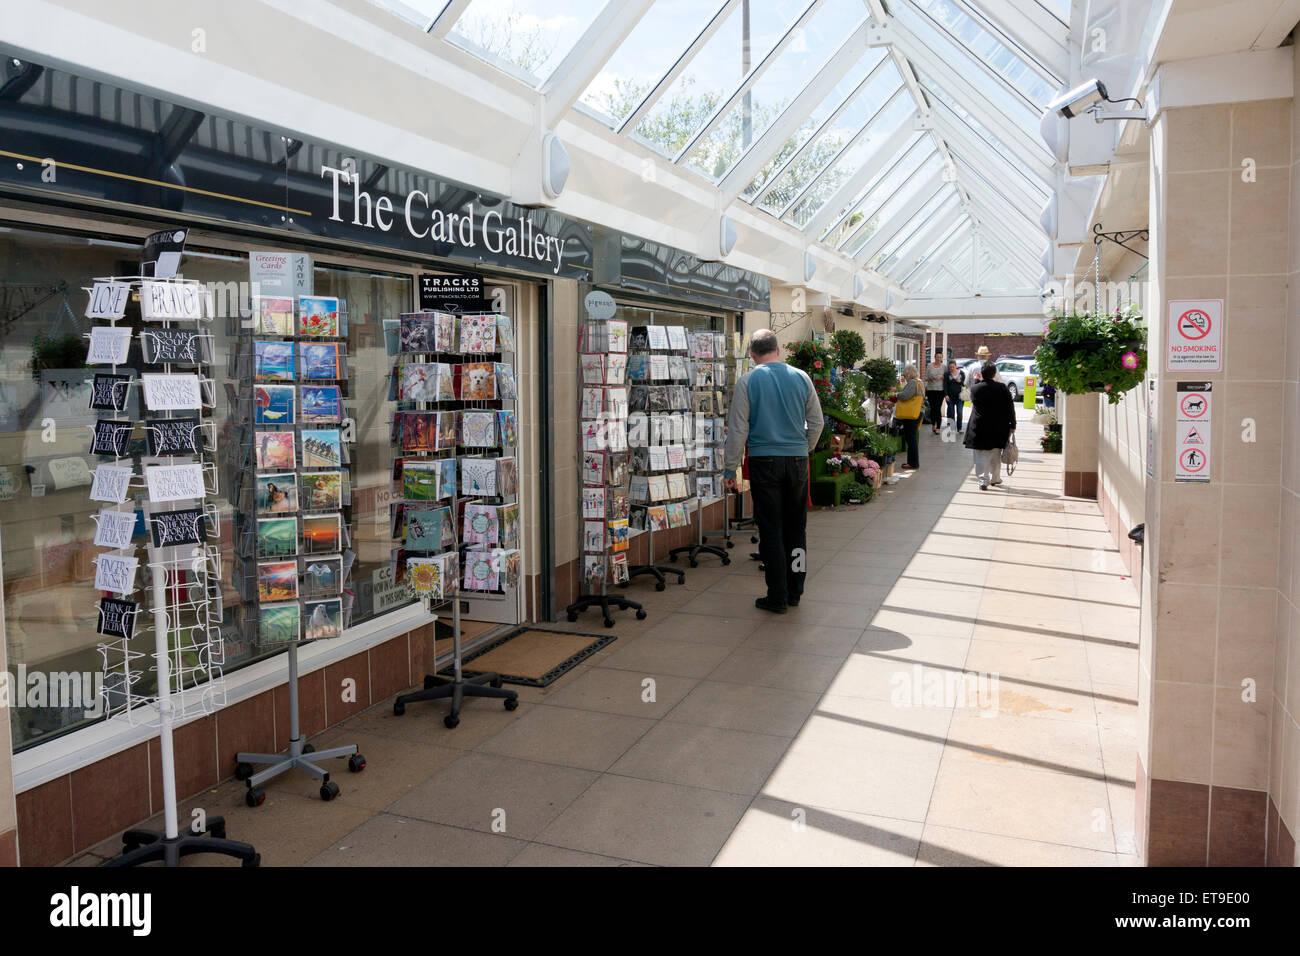 The Forge shopping centre, Stockton Heath - Stock Image